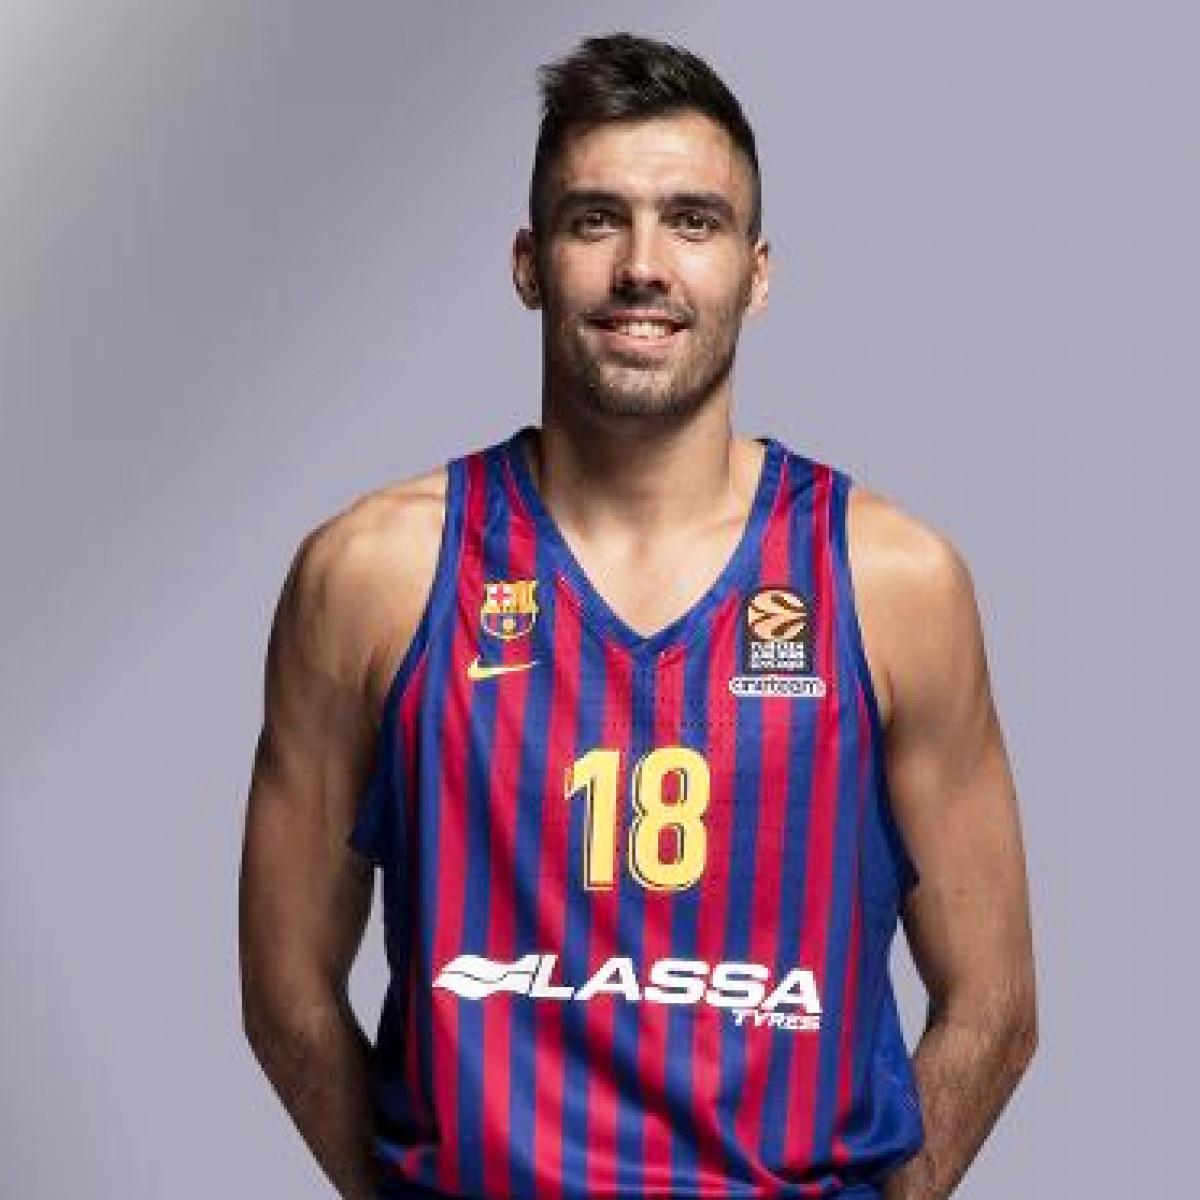 Photo of Pere Oriola, 2019-2020 season